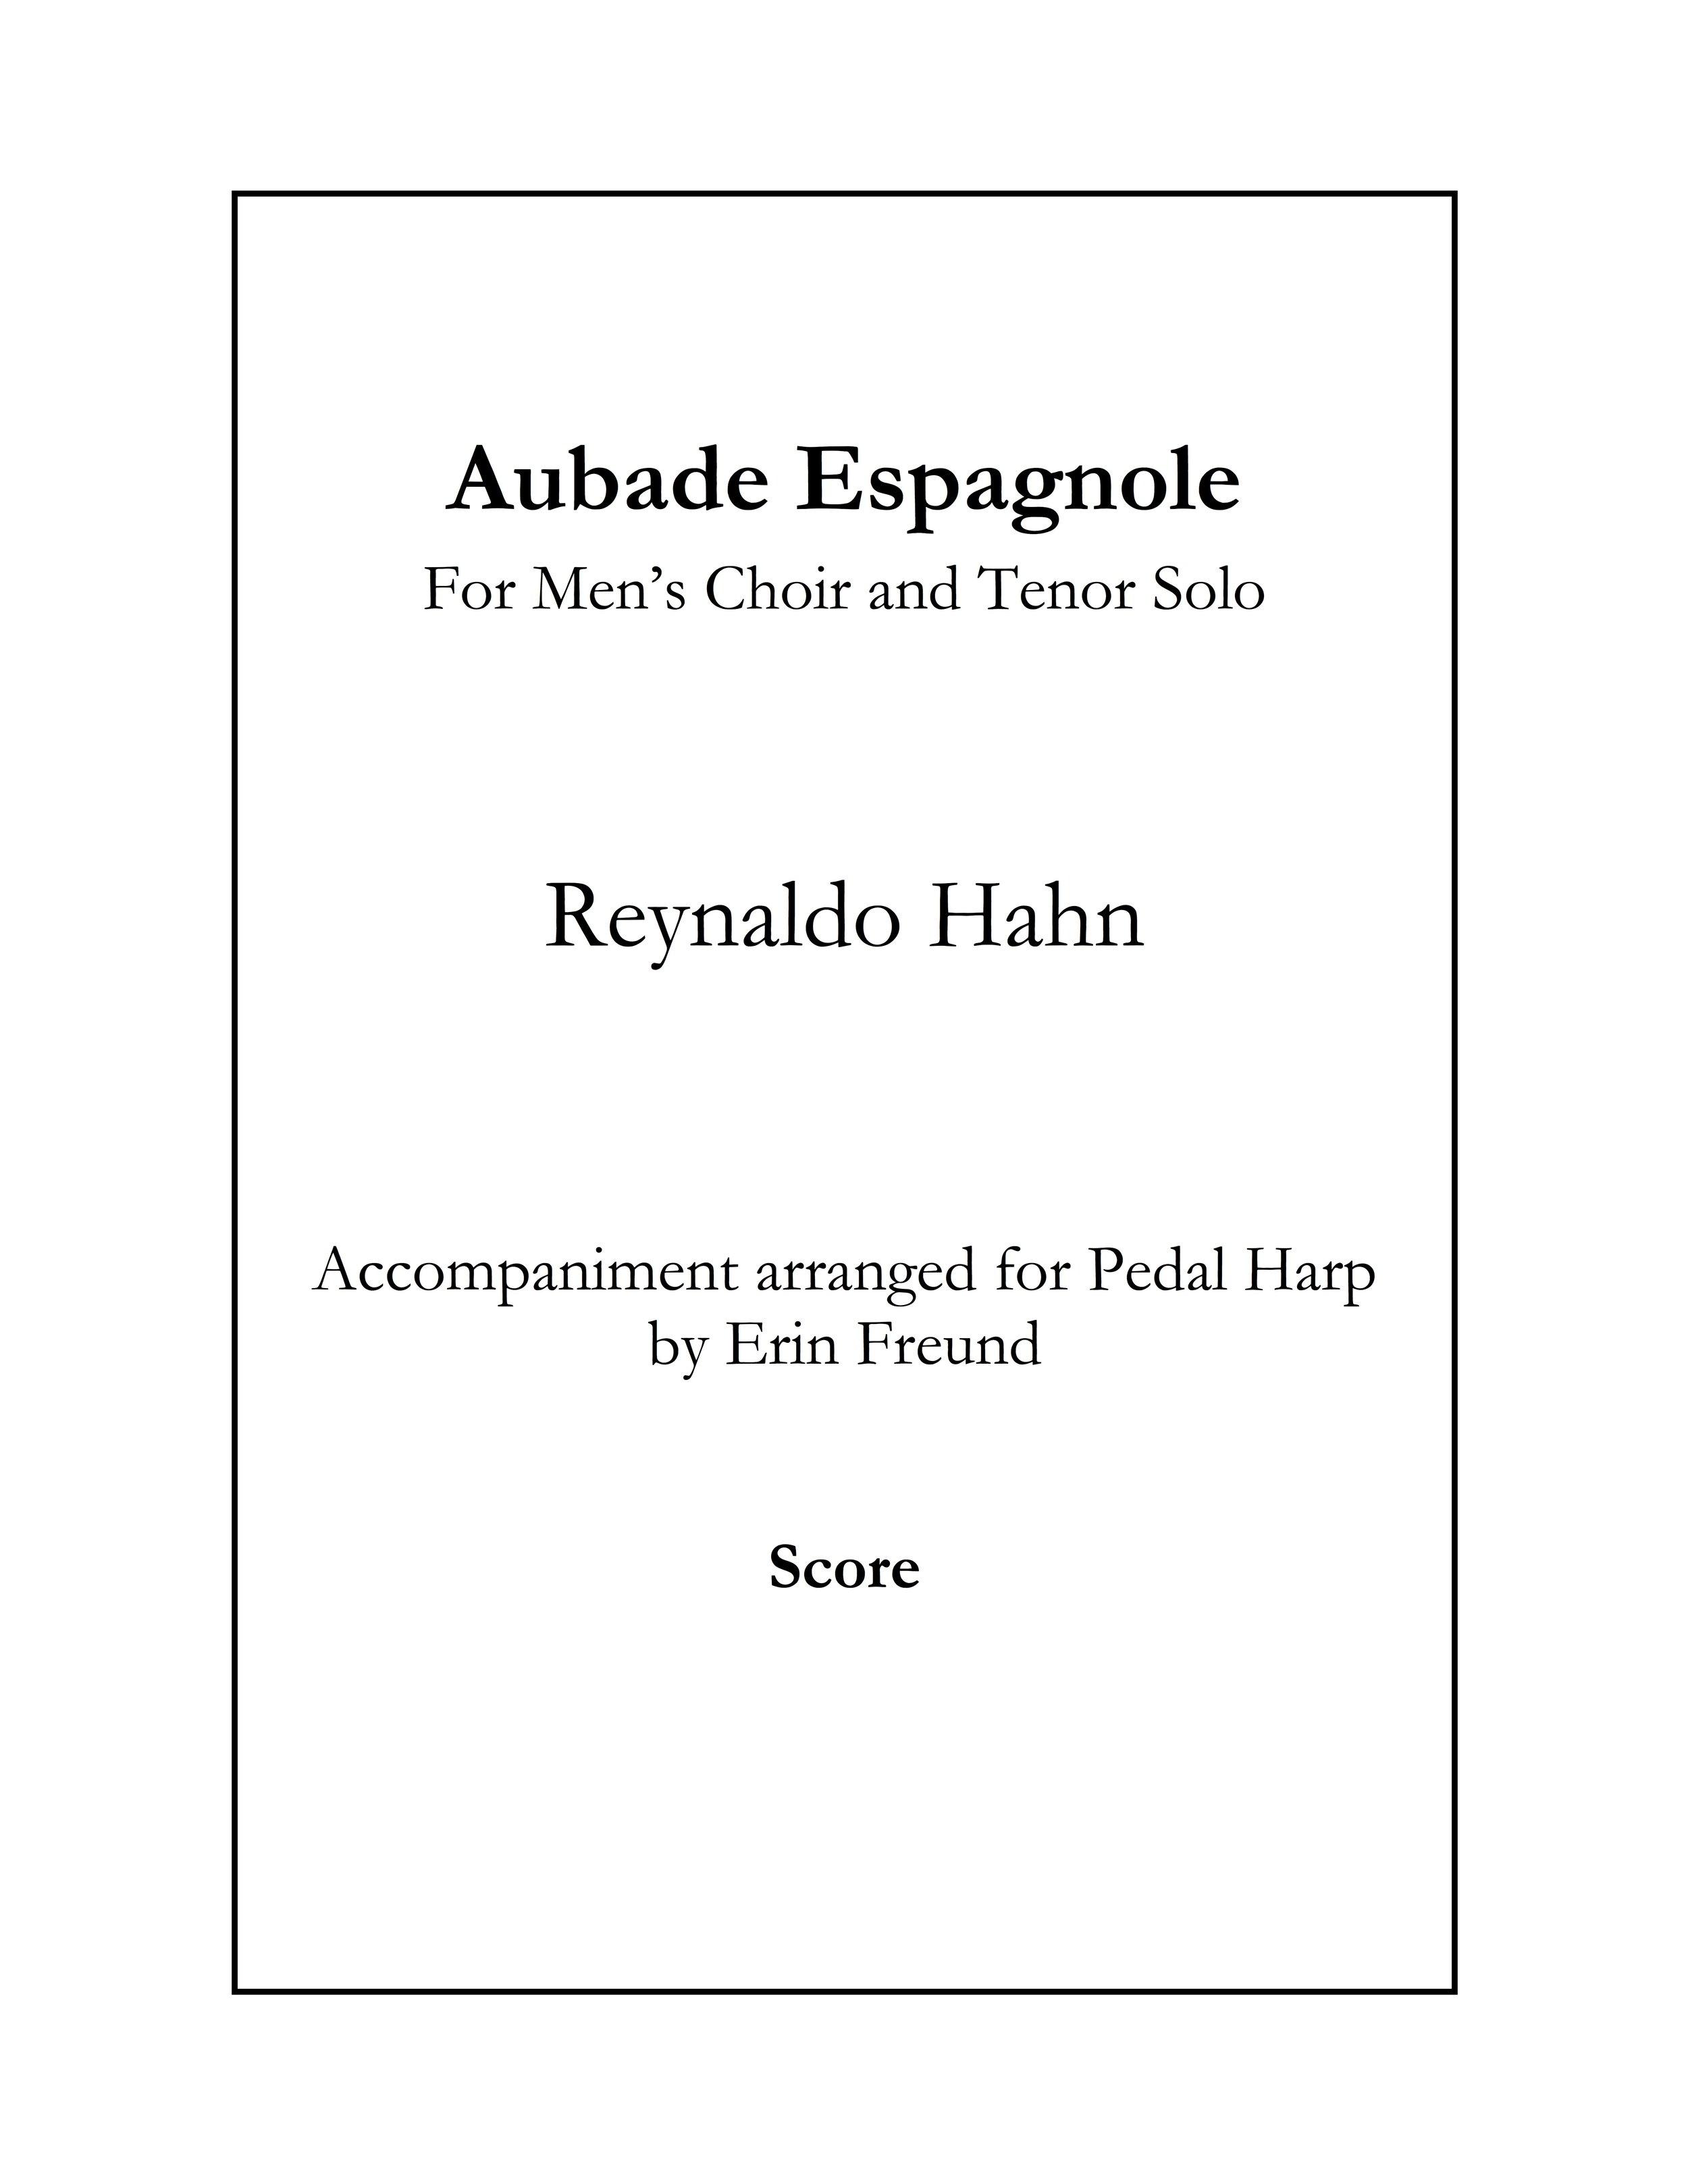 Hahn aubade espagnole score cover.jpg